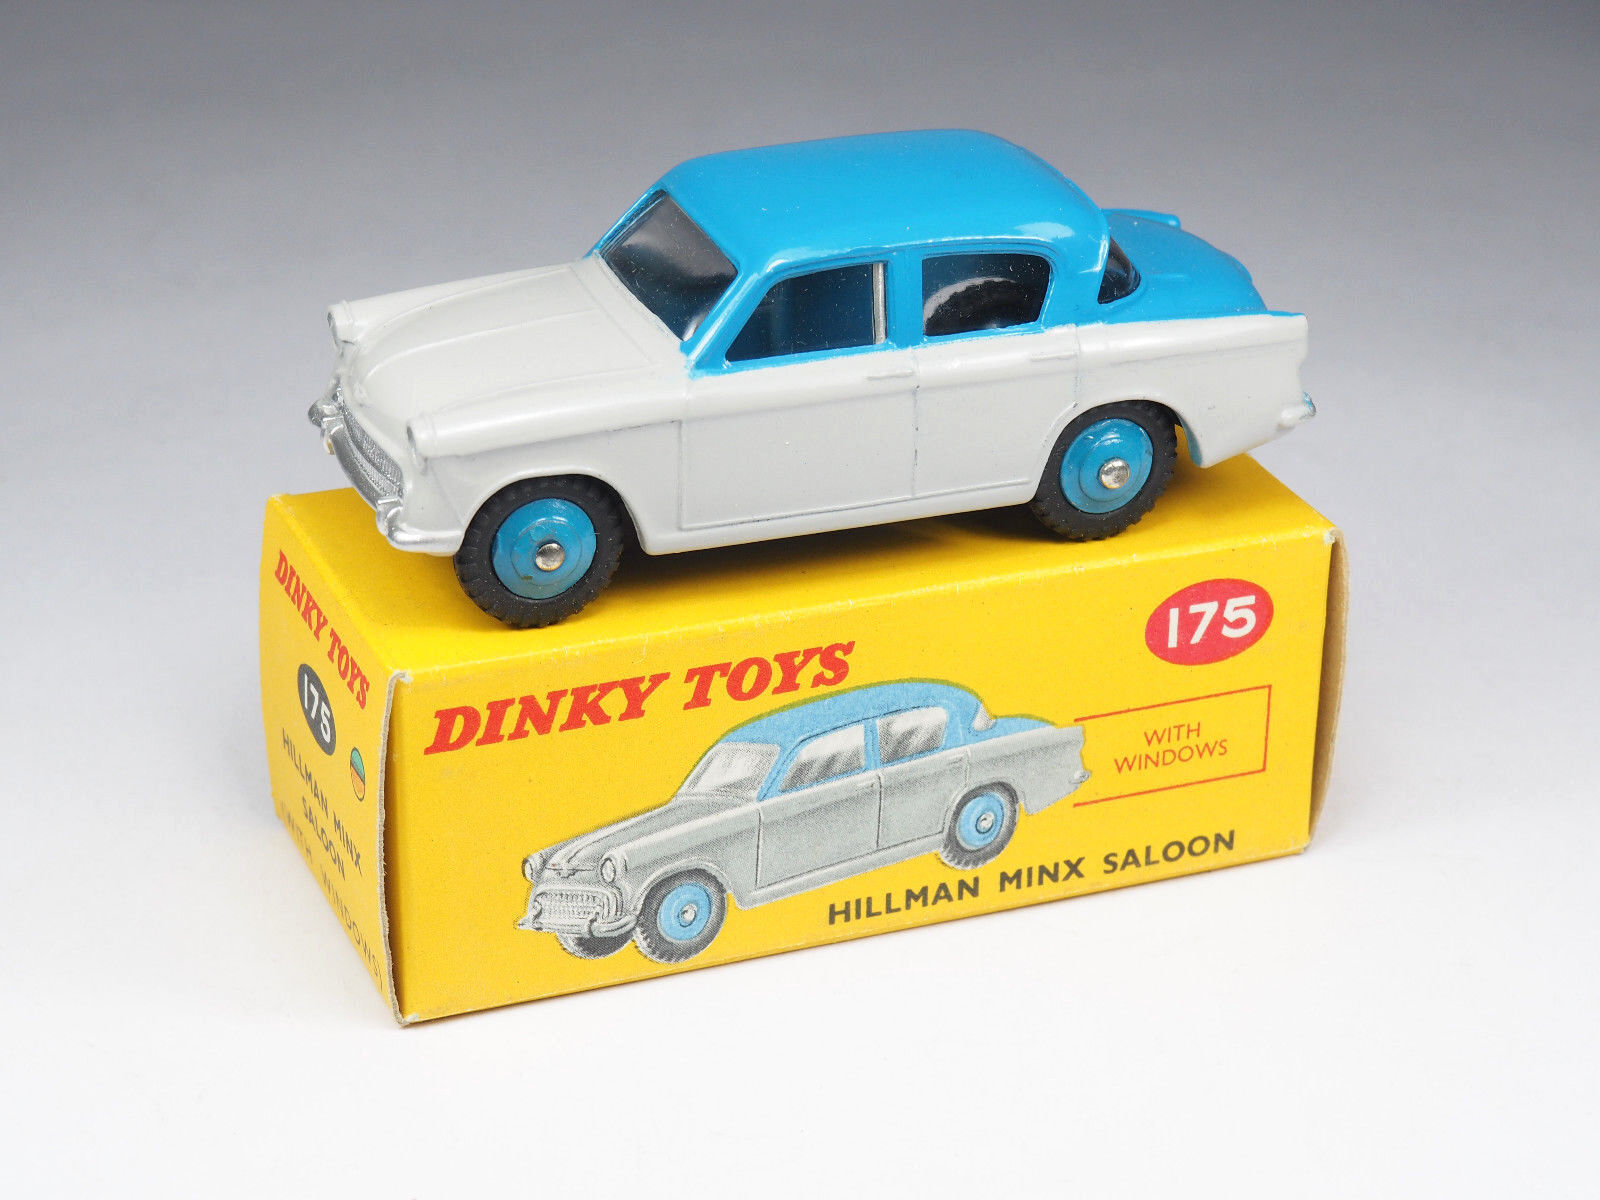 Dinky toys england - 175-hillman minx saloon - 1 43e